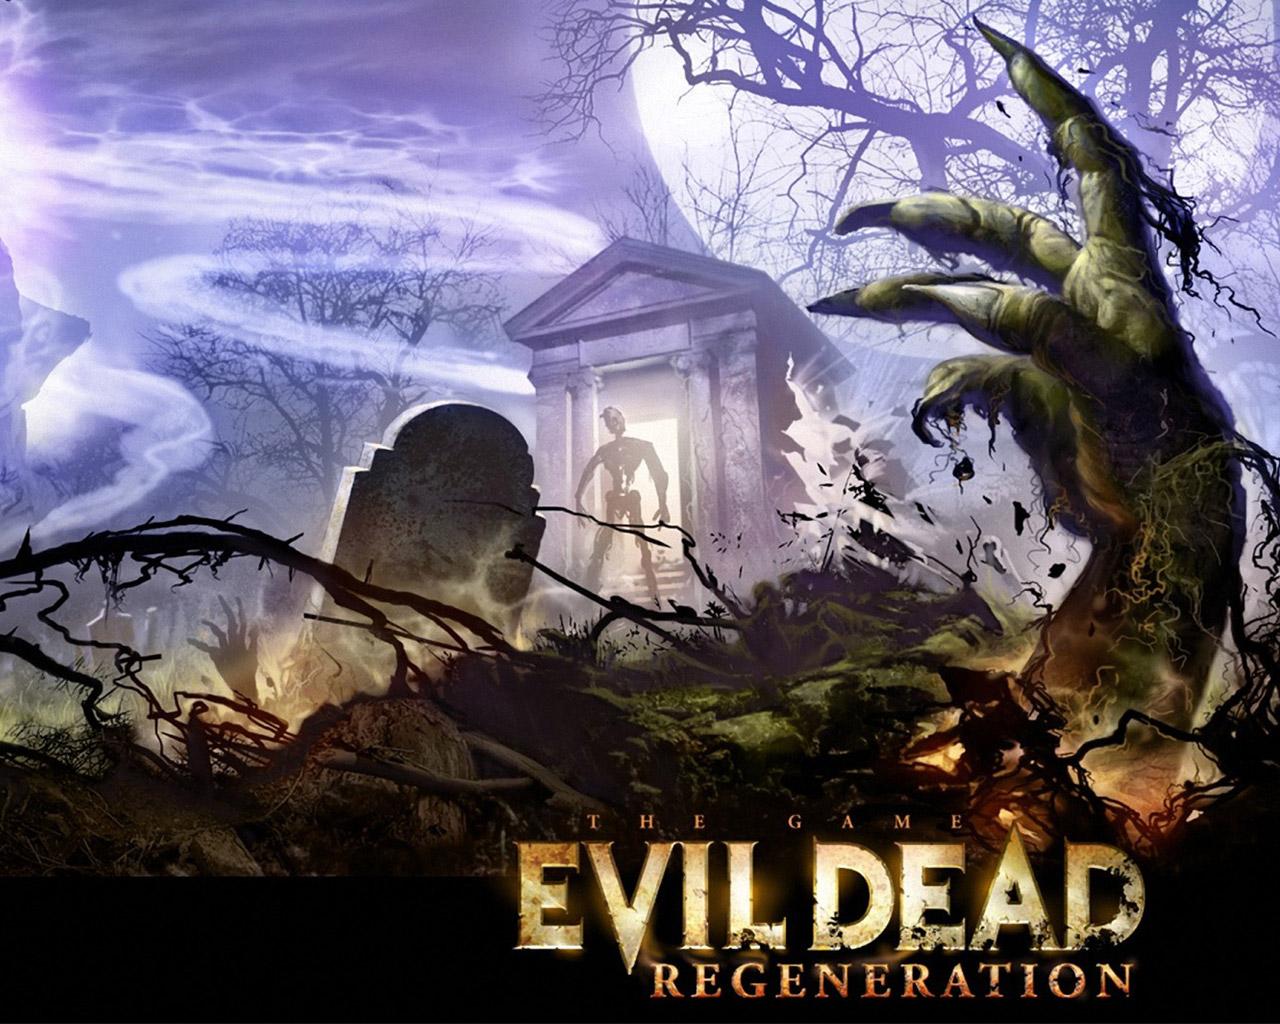 Evil Dead: Regeneration Wallpaper in 1280x1024